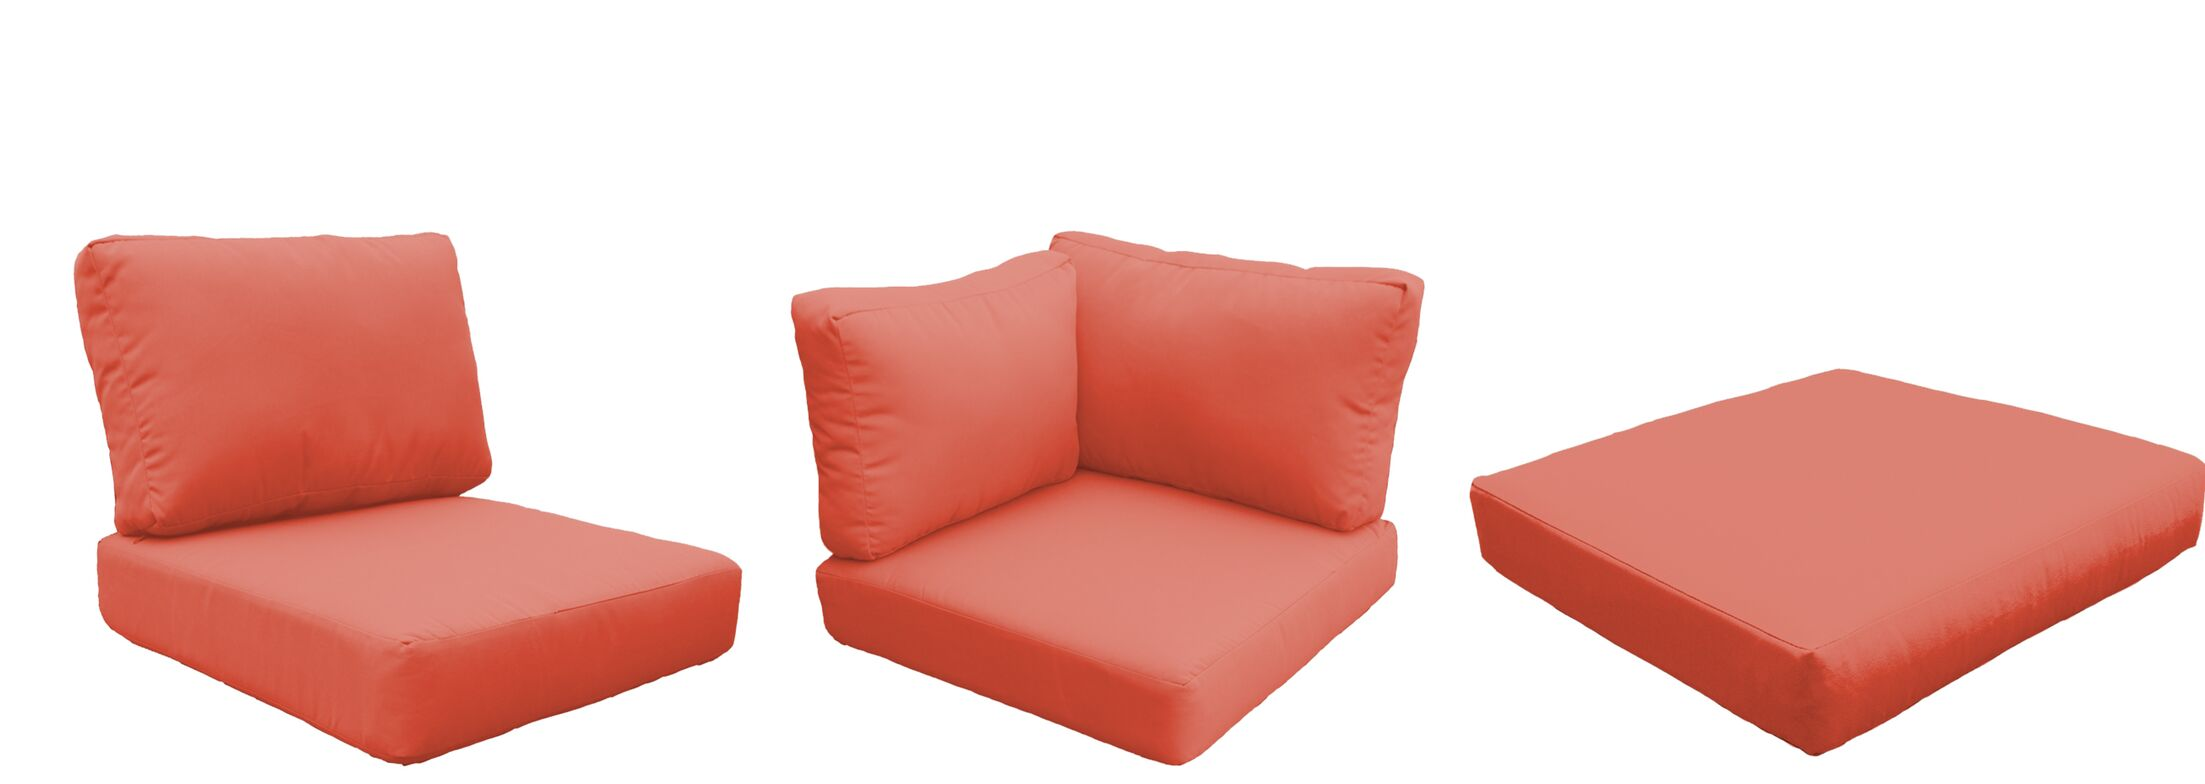 Fairmont Outdoor 19 Piece Lounge Chair Cushion Set Fabric: Tangerine